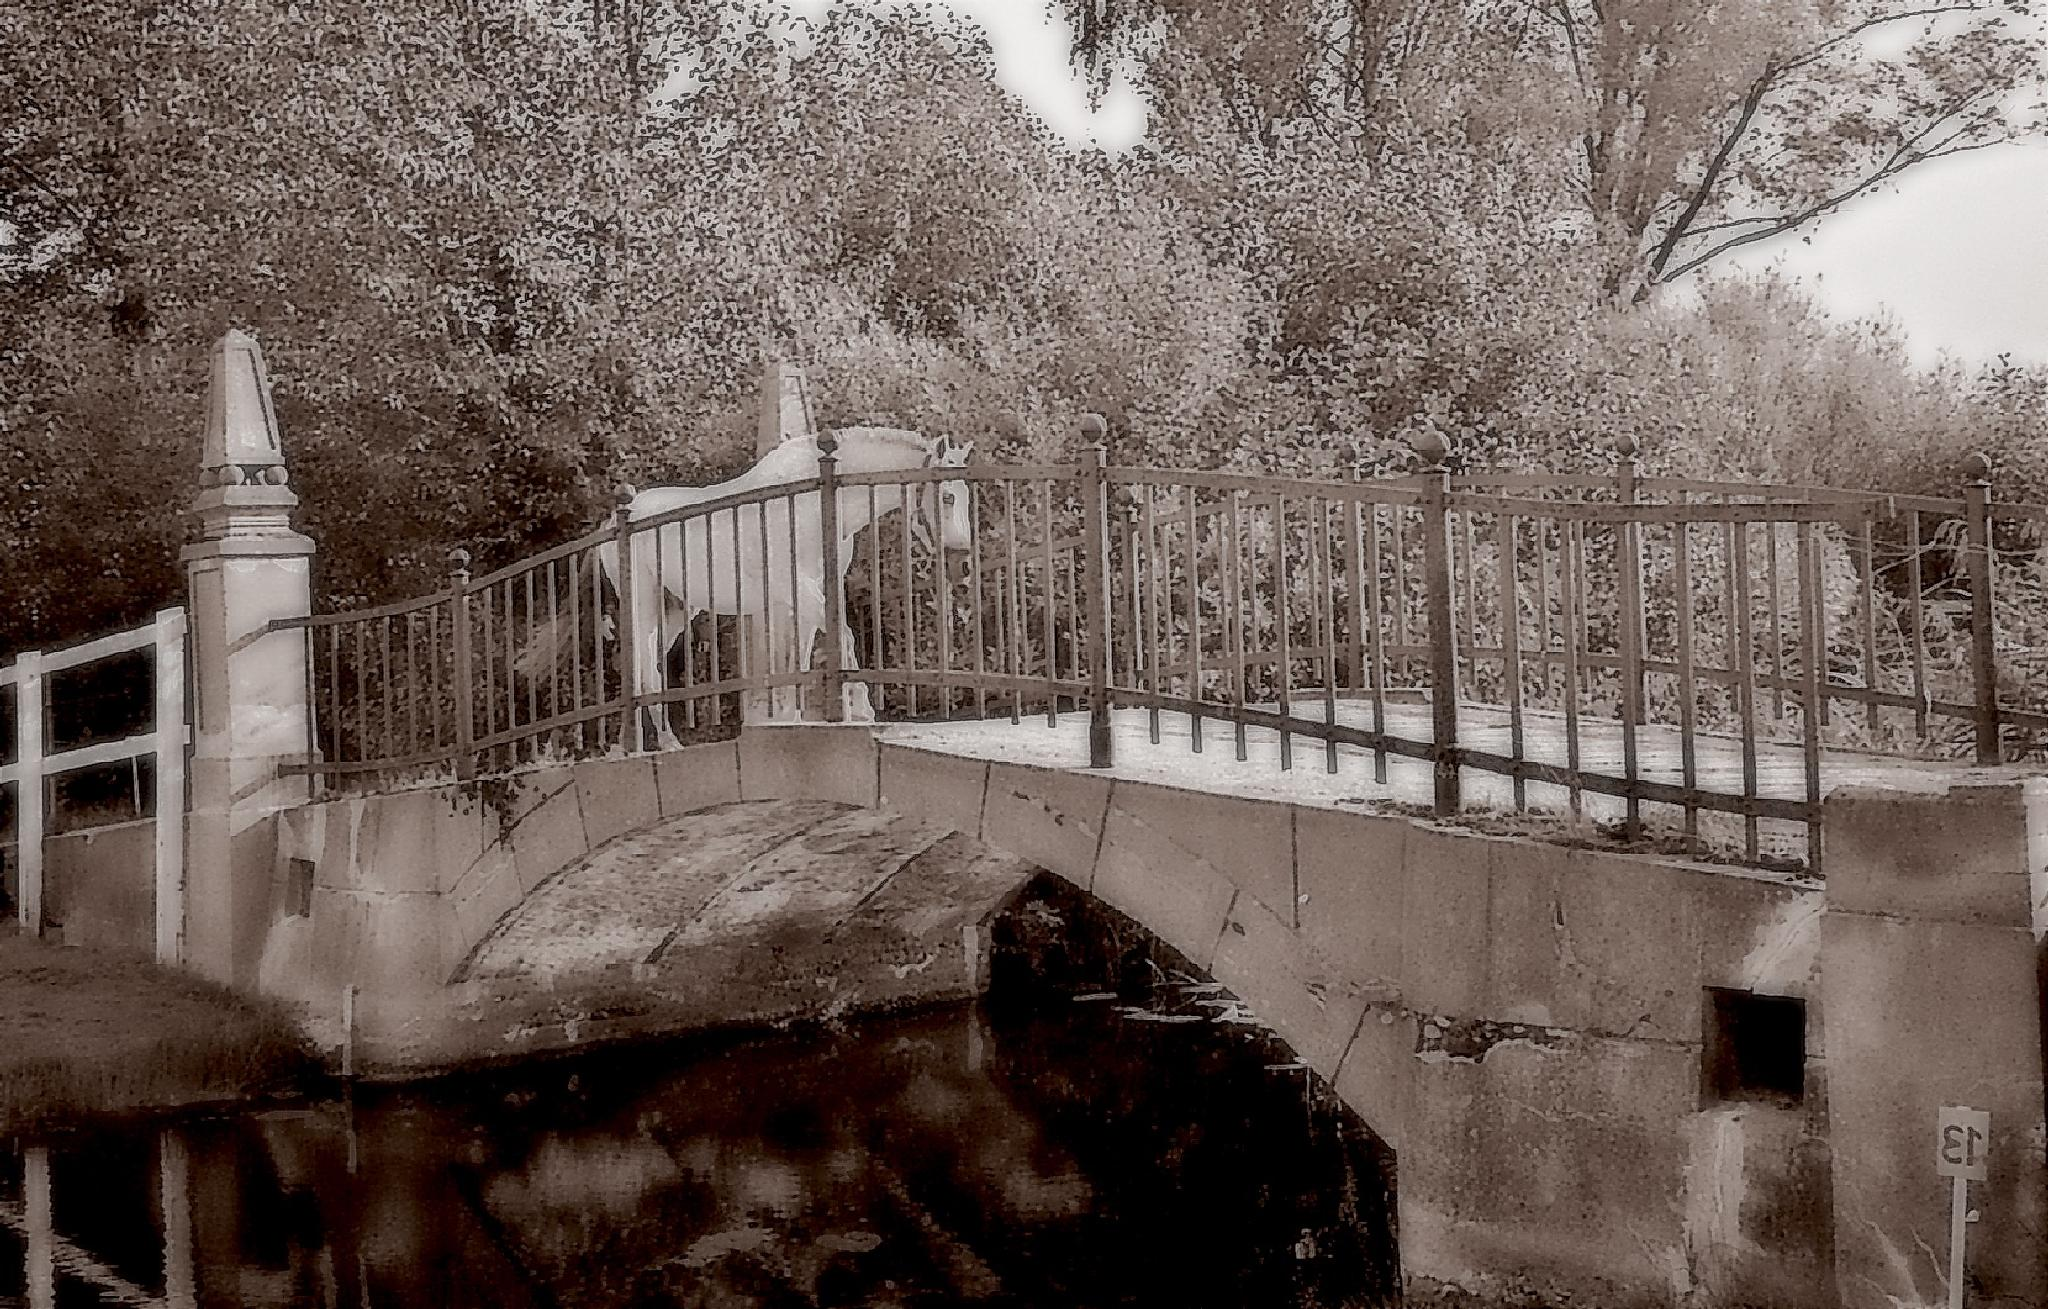 Horse on the bridge by RONNIE ERICSON